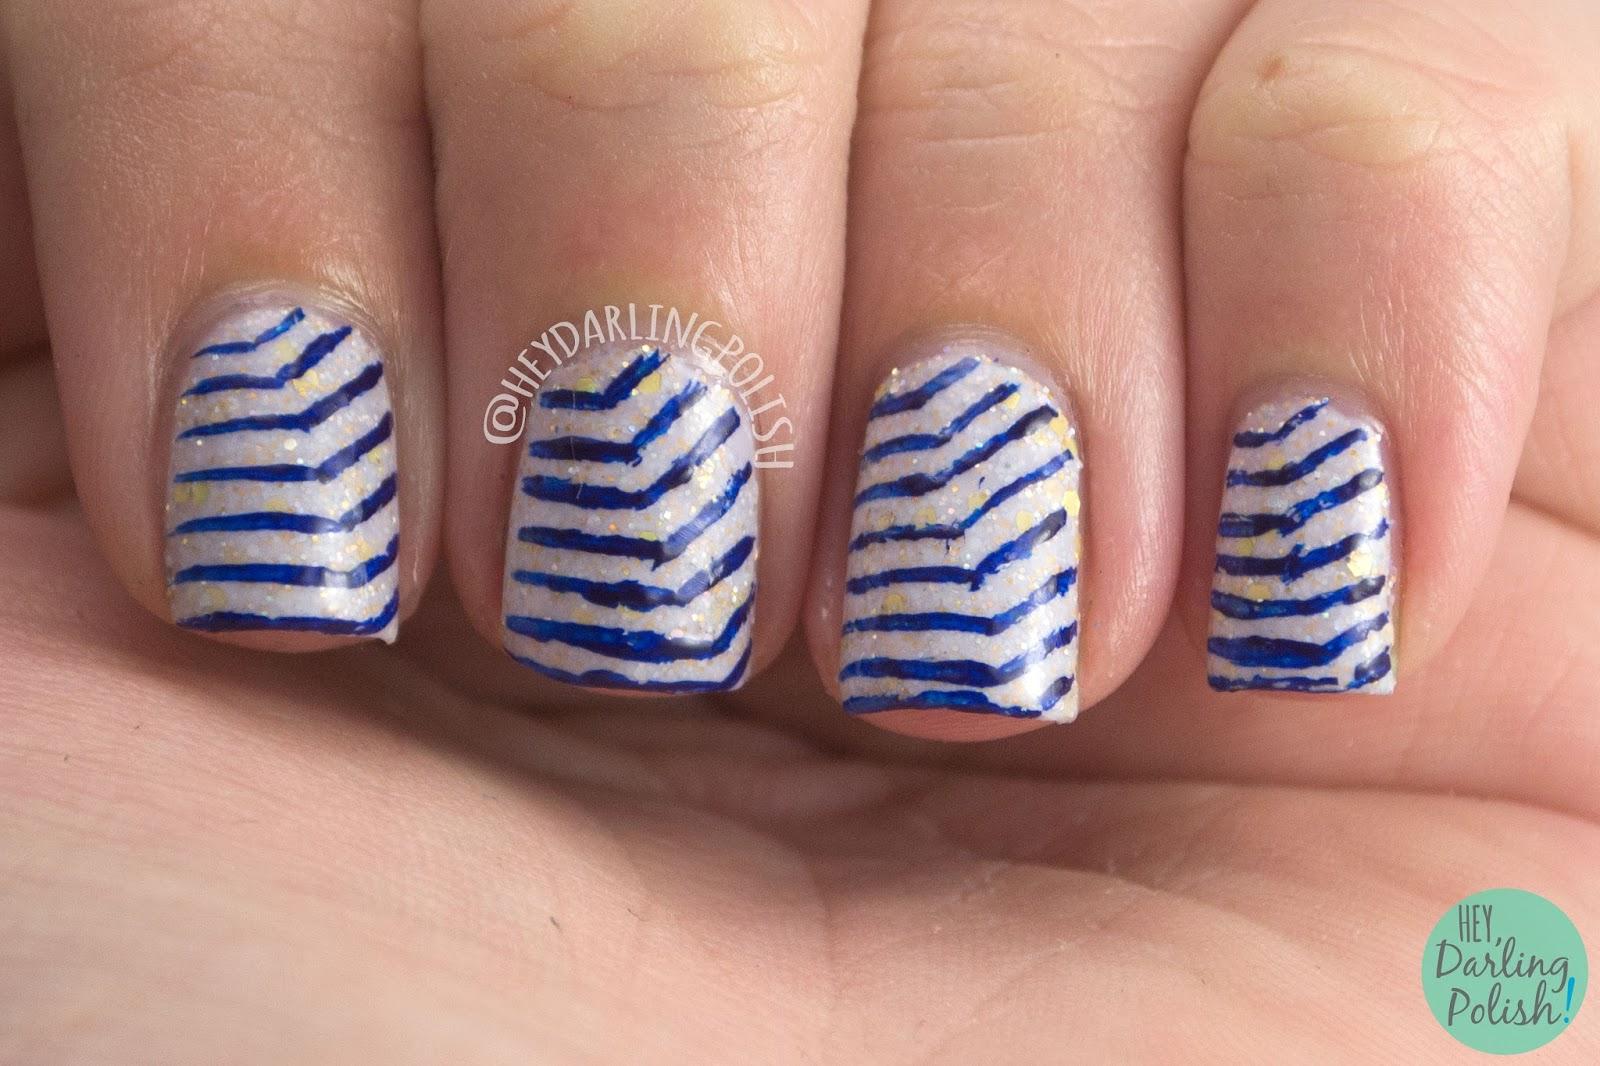 lines, blue, olaf's snowflowers, nails, nail art, nail polish, hey darling polish, black dahlia lacquer, indie polish